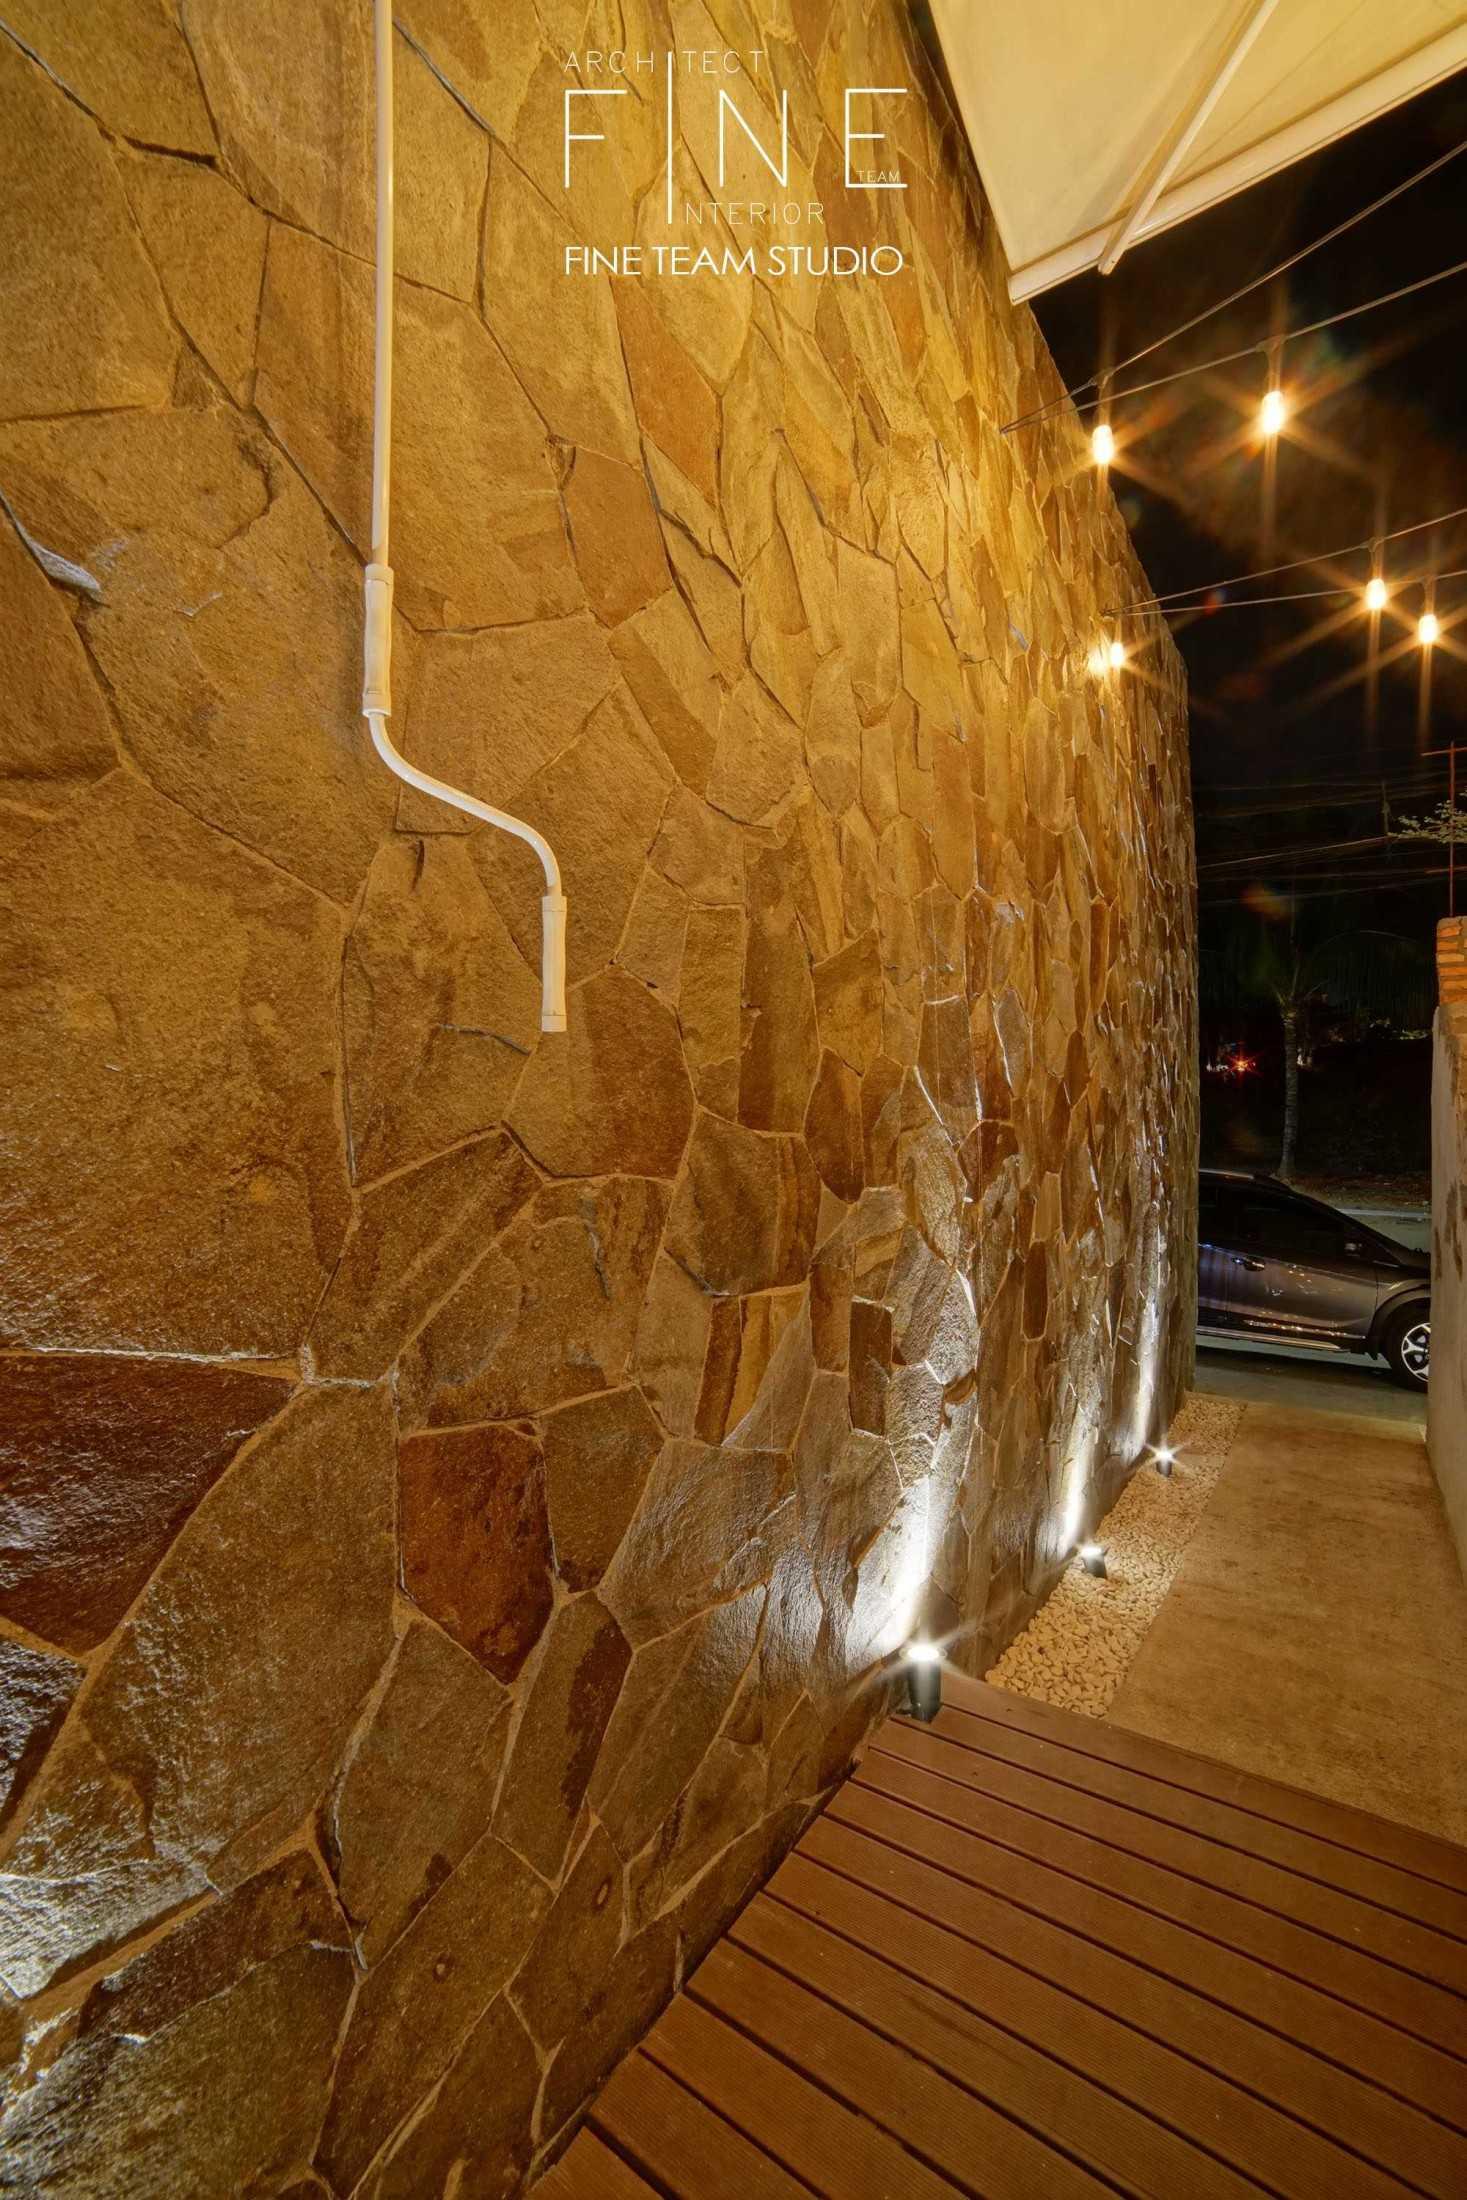 Fine Team Studio Delapan Gram Blok O, Jl. Pluit Karang Bar. No.6 No. 14, Rt.2/rw.8, Pluit, Penjaringan, Jakarta, Daerah Khusus Ibukota Jakarta 14450, Indonesia Blok O, Jl. Pluit Karang Bar. No.6 No. 14, Rt.2/rw.8, Pluit, Penjaringan, Jakarta, Daerah Khusus Ibukota Jakarta 14450, Indonesia Fine-Team-Studio-Delapan-Gram Industrial 56045